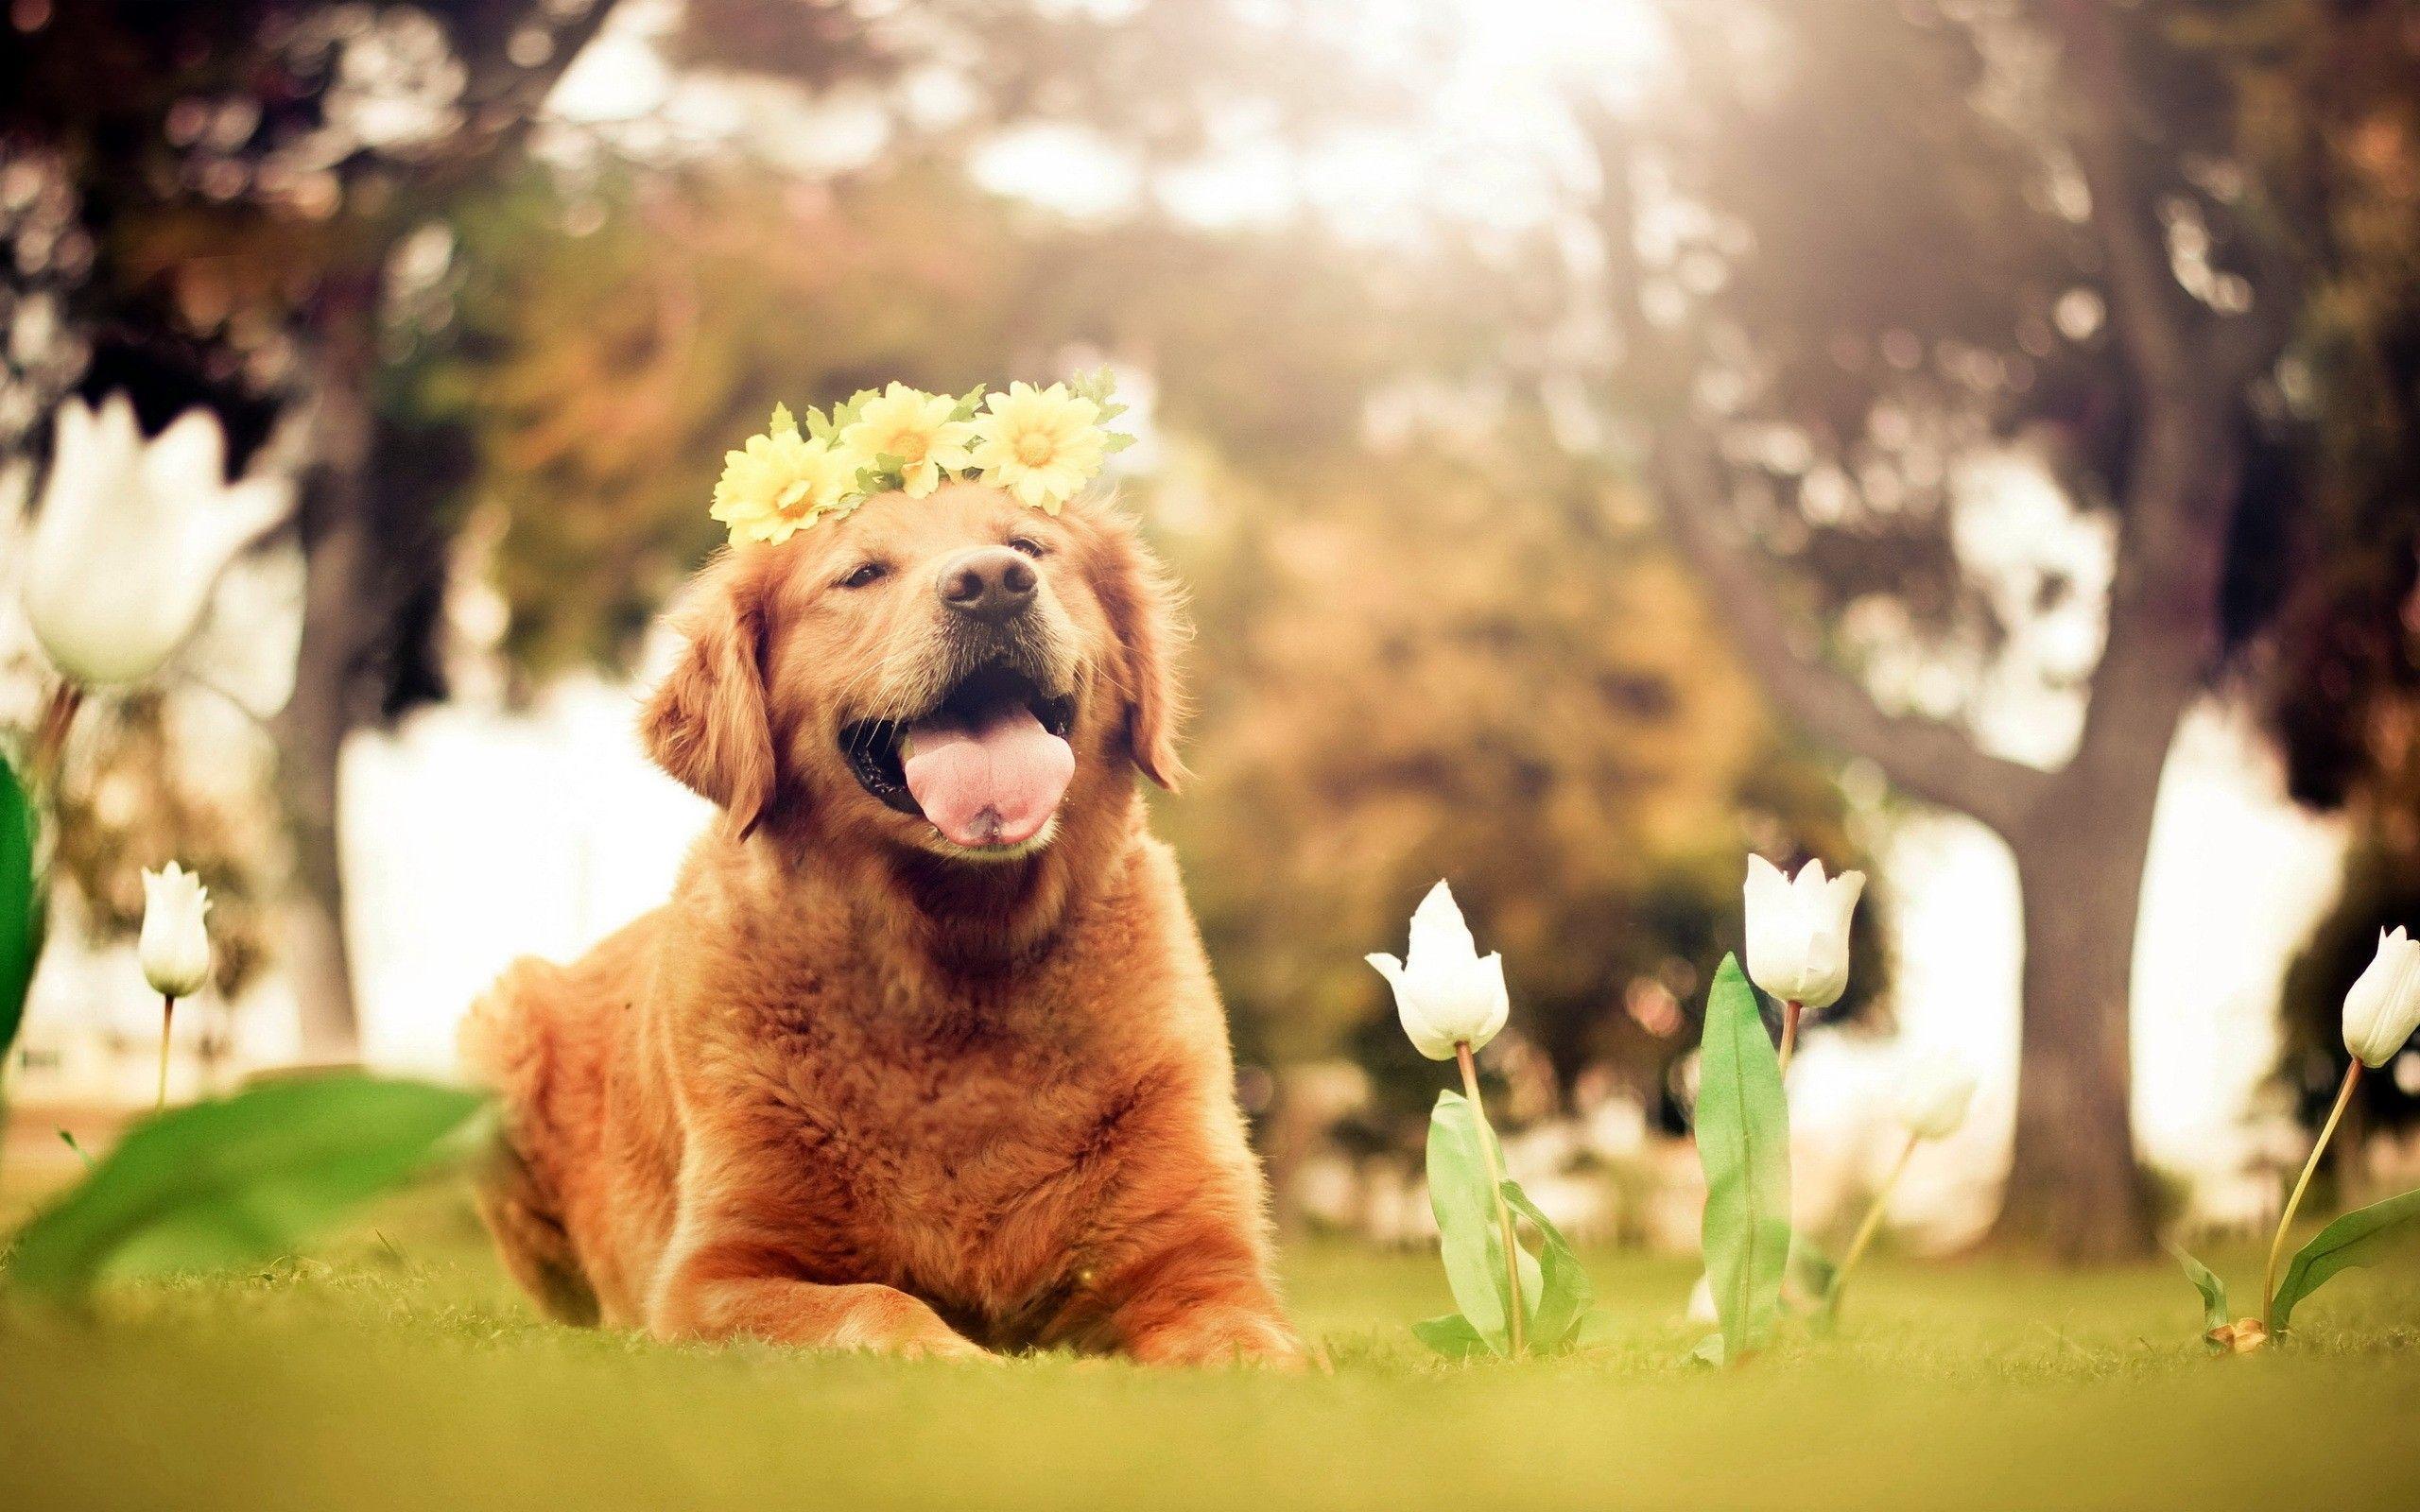 Springtime Dog Wallpapers Top Free Springtime Dog Backgrounds Wallpaperaccess